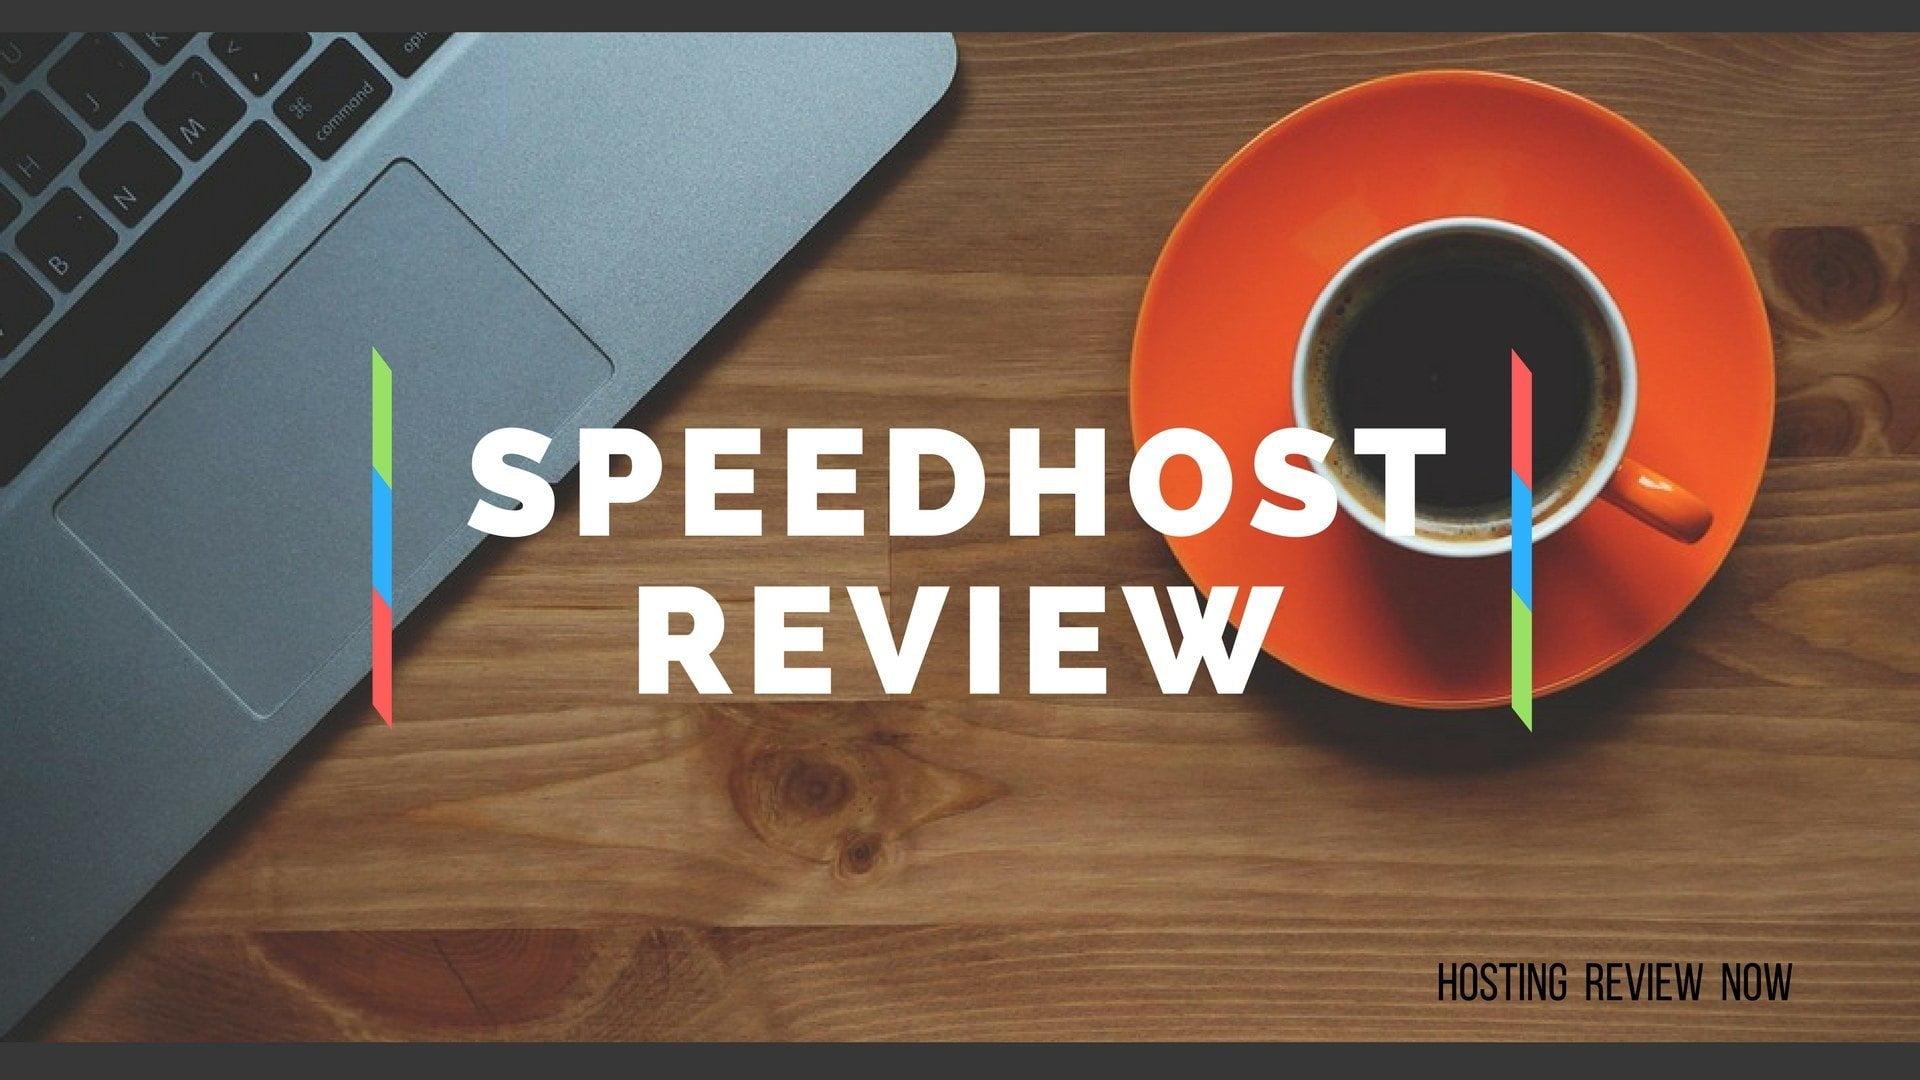 SpeedHost Review